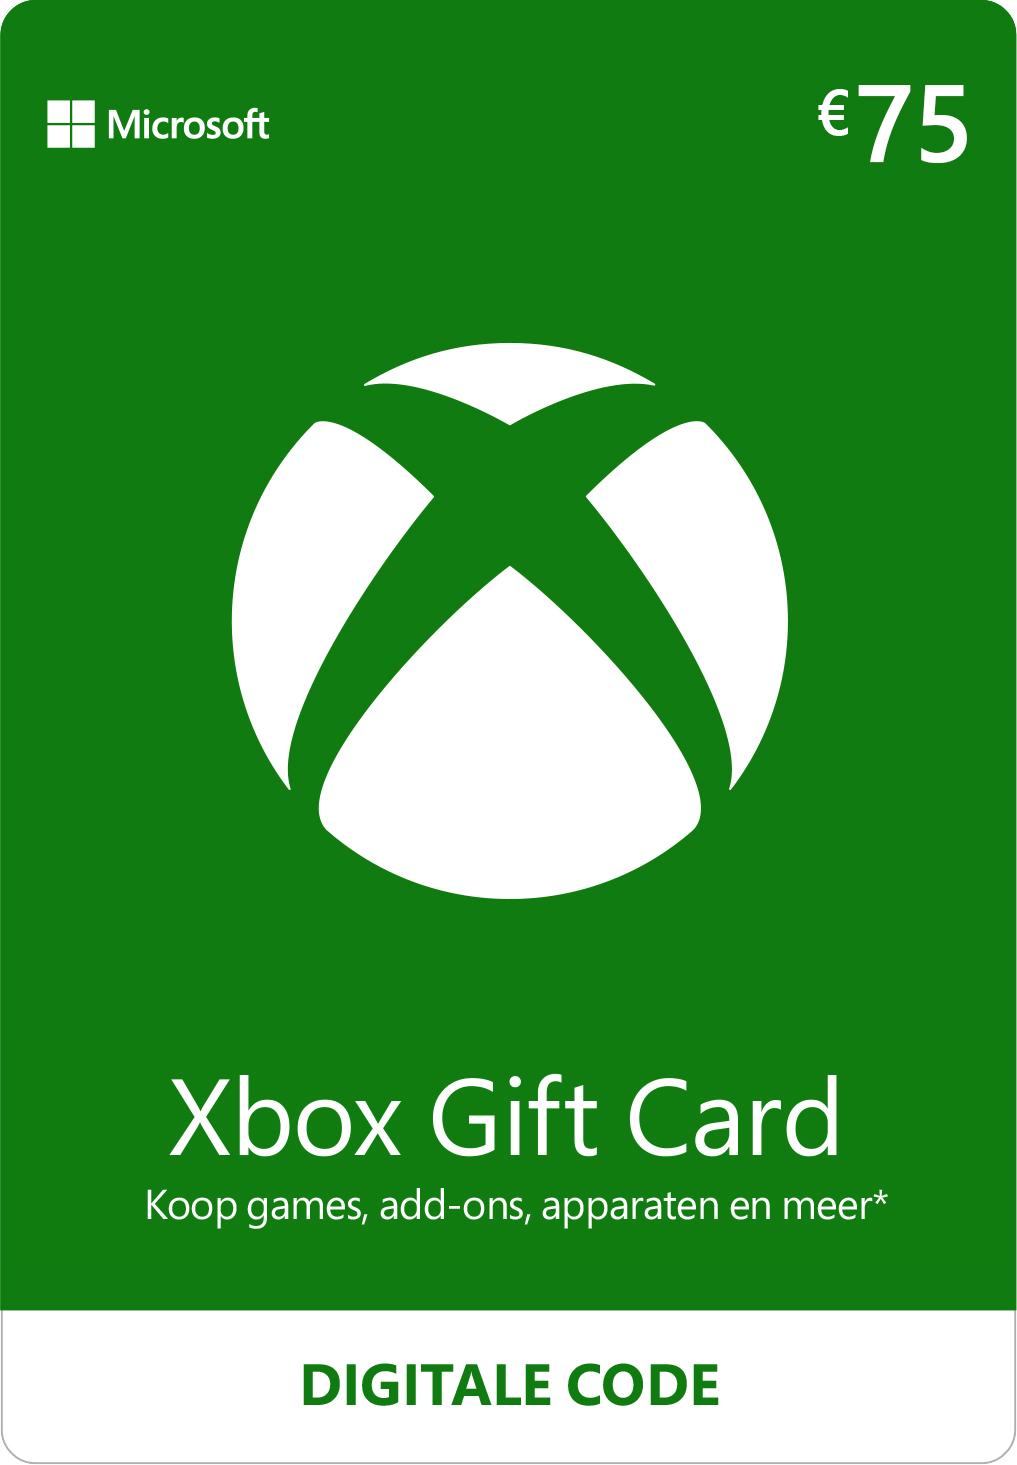 Xbox Gift Card €75